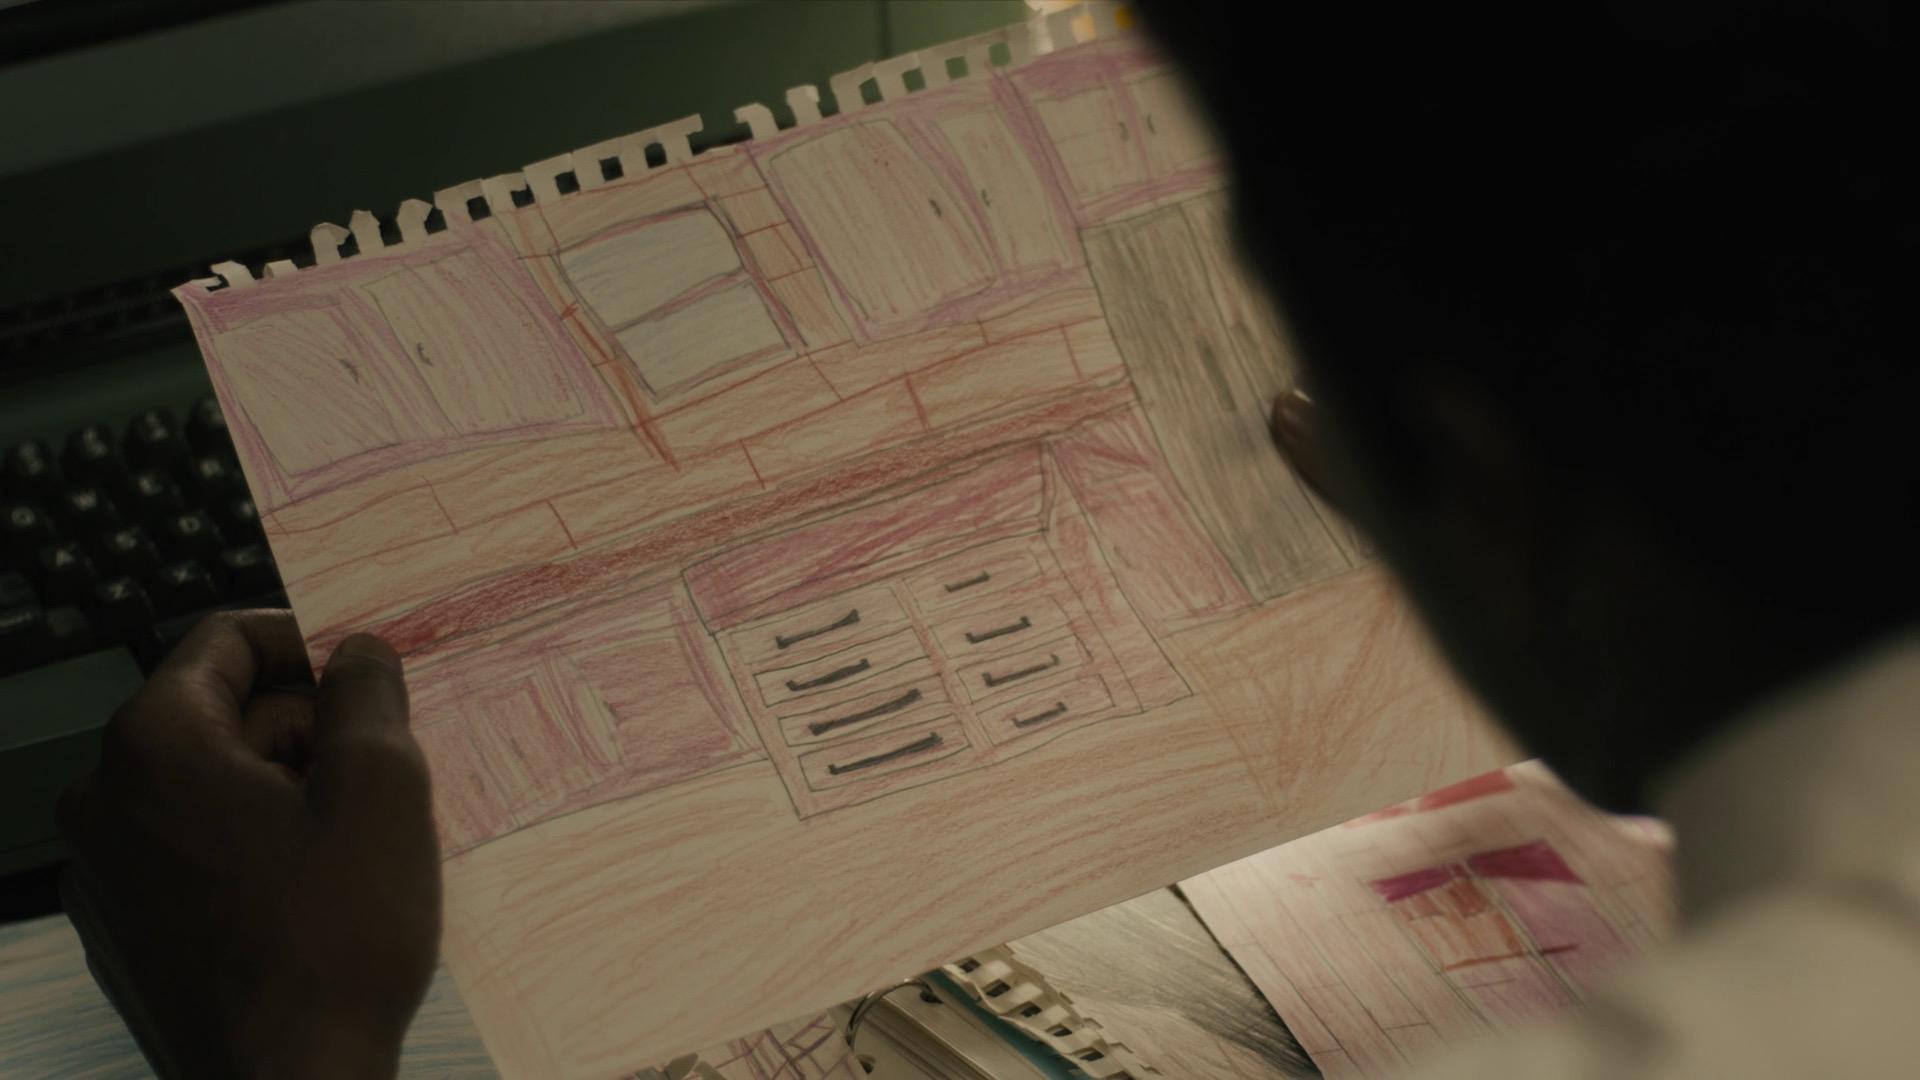 True Detective season 3 ep 6 recap: Hoyt theories & Harris James